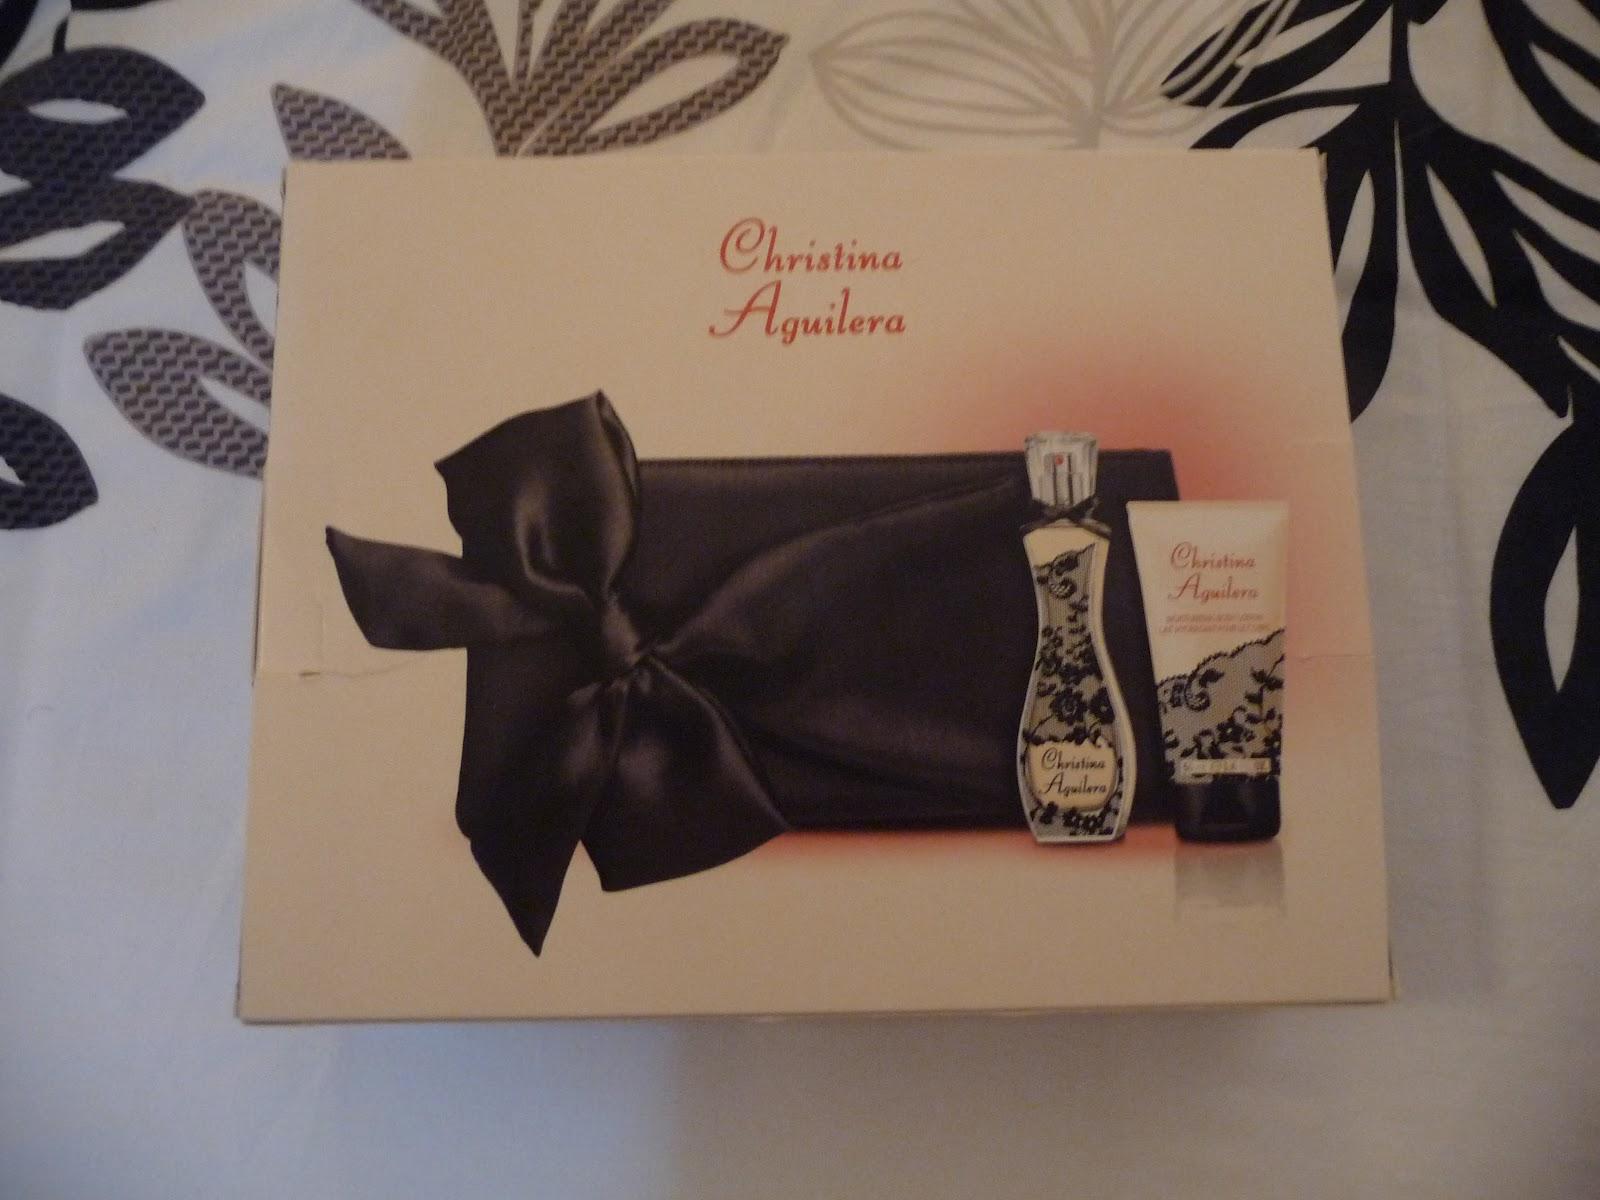 Brand New Fossil Key Per Crossbody In Bird Print Thrift Hangers Keyper Cross Body Calypso Christina Aguilera Fragrance Set